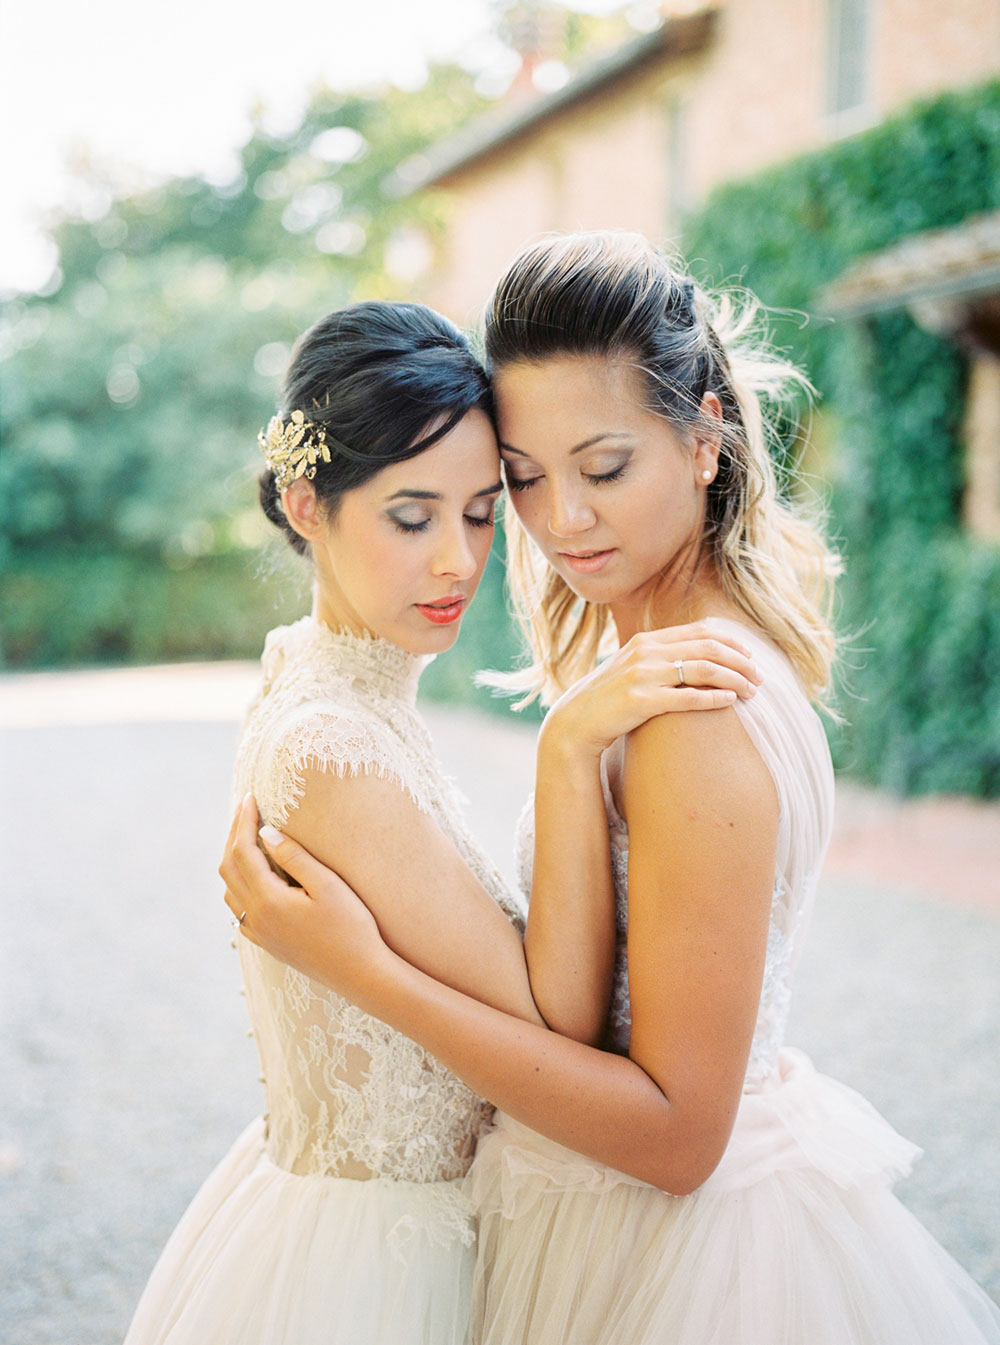 Linari-Tuscany-Elopement-Courtney-Michaela-157